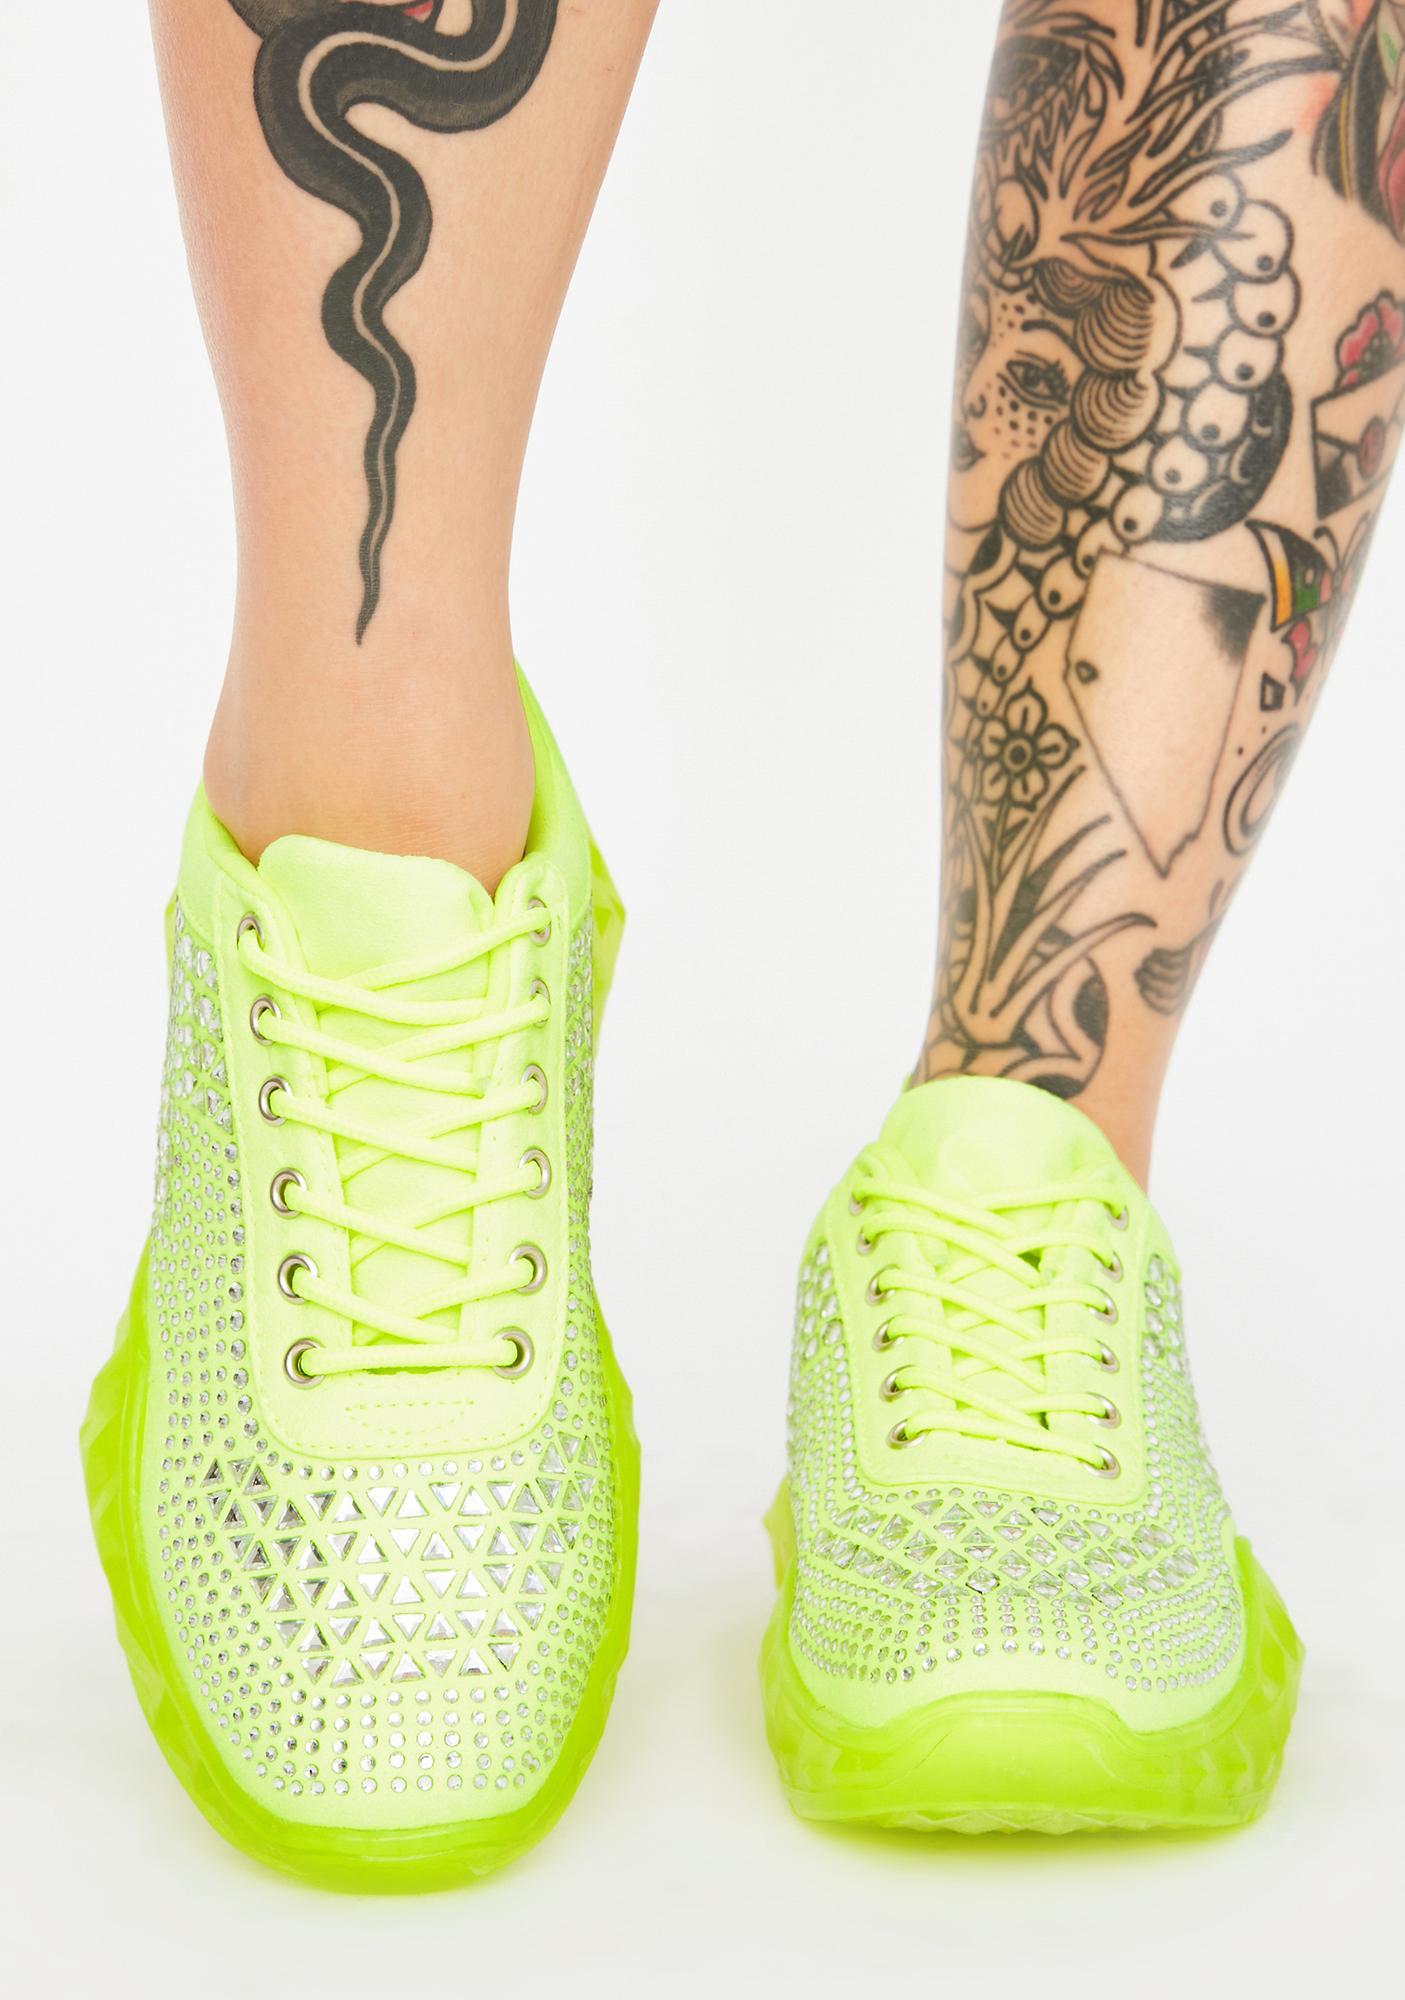 Vivid Break The Ice Diamante Sneakers